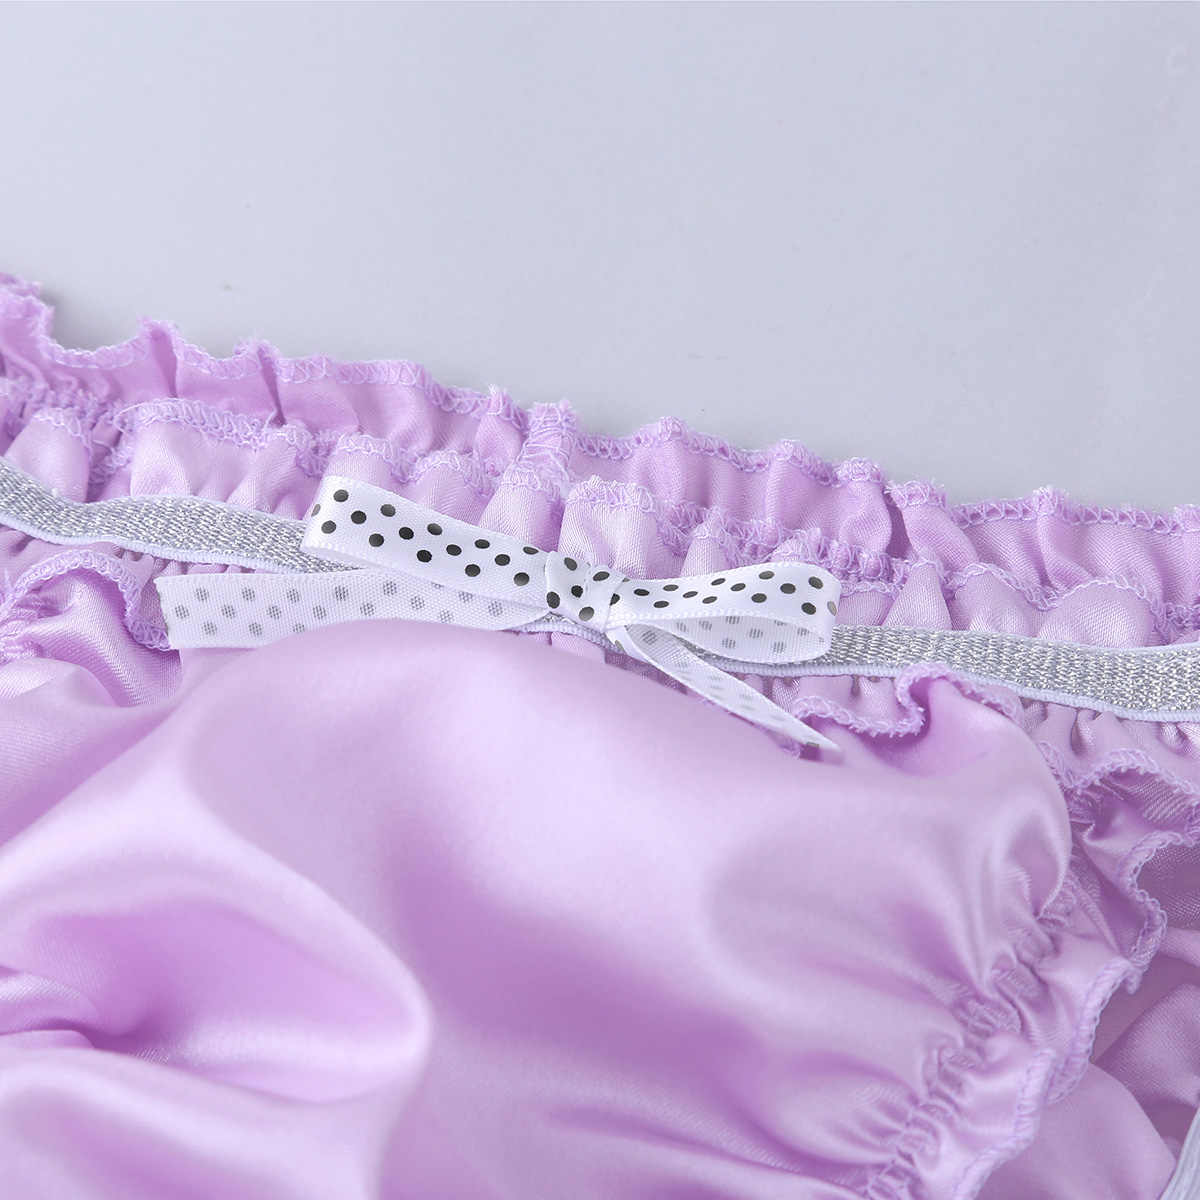 3eefdc43b ... iiniim Mens Lingerie Soft Triangle Panties Shiny Ruffled Frilly Low  Rise Stretchy Sissy Bikini Briefs Underwear ...